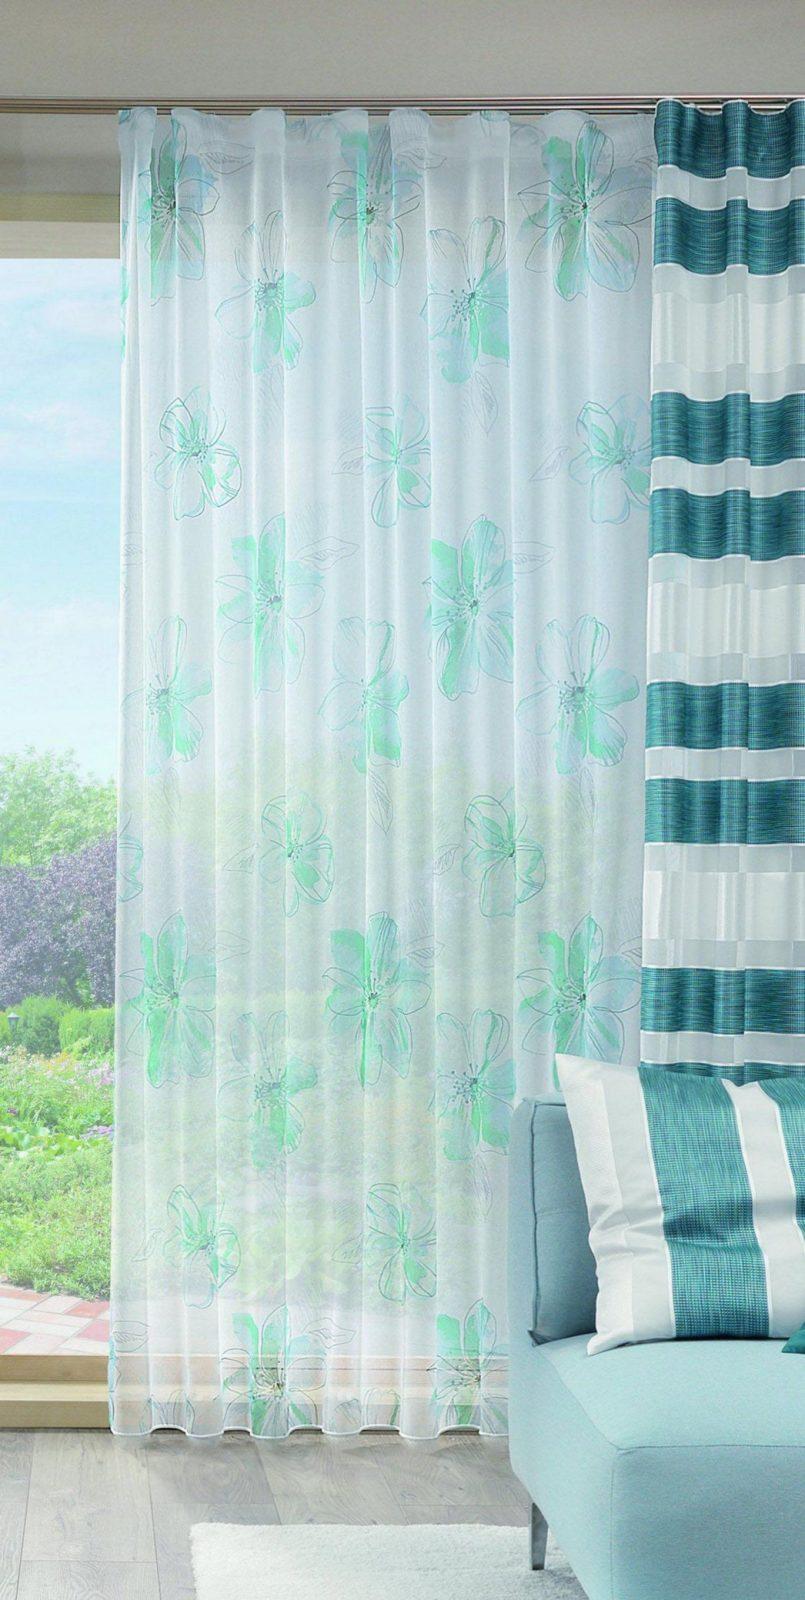 Vorhang Hochbett Selber Nähen Strahlend Gardinen Nähen Ohne von Gardinen Selber Nähen Faltenband Bild